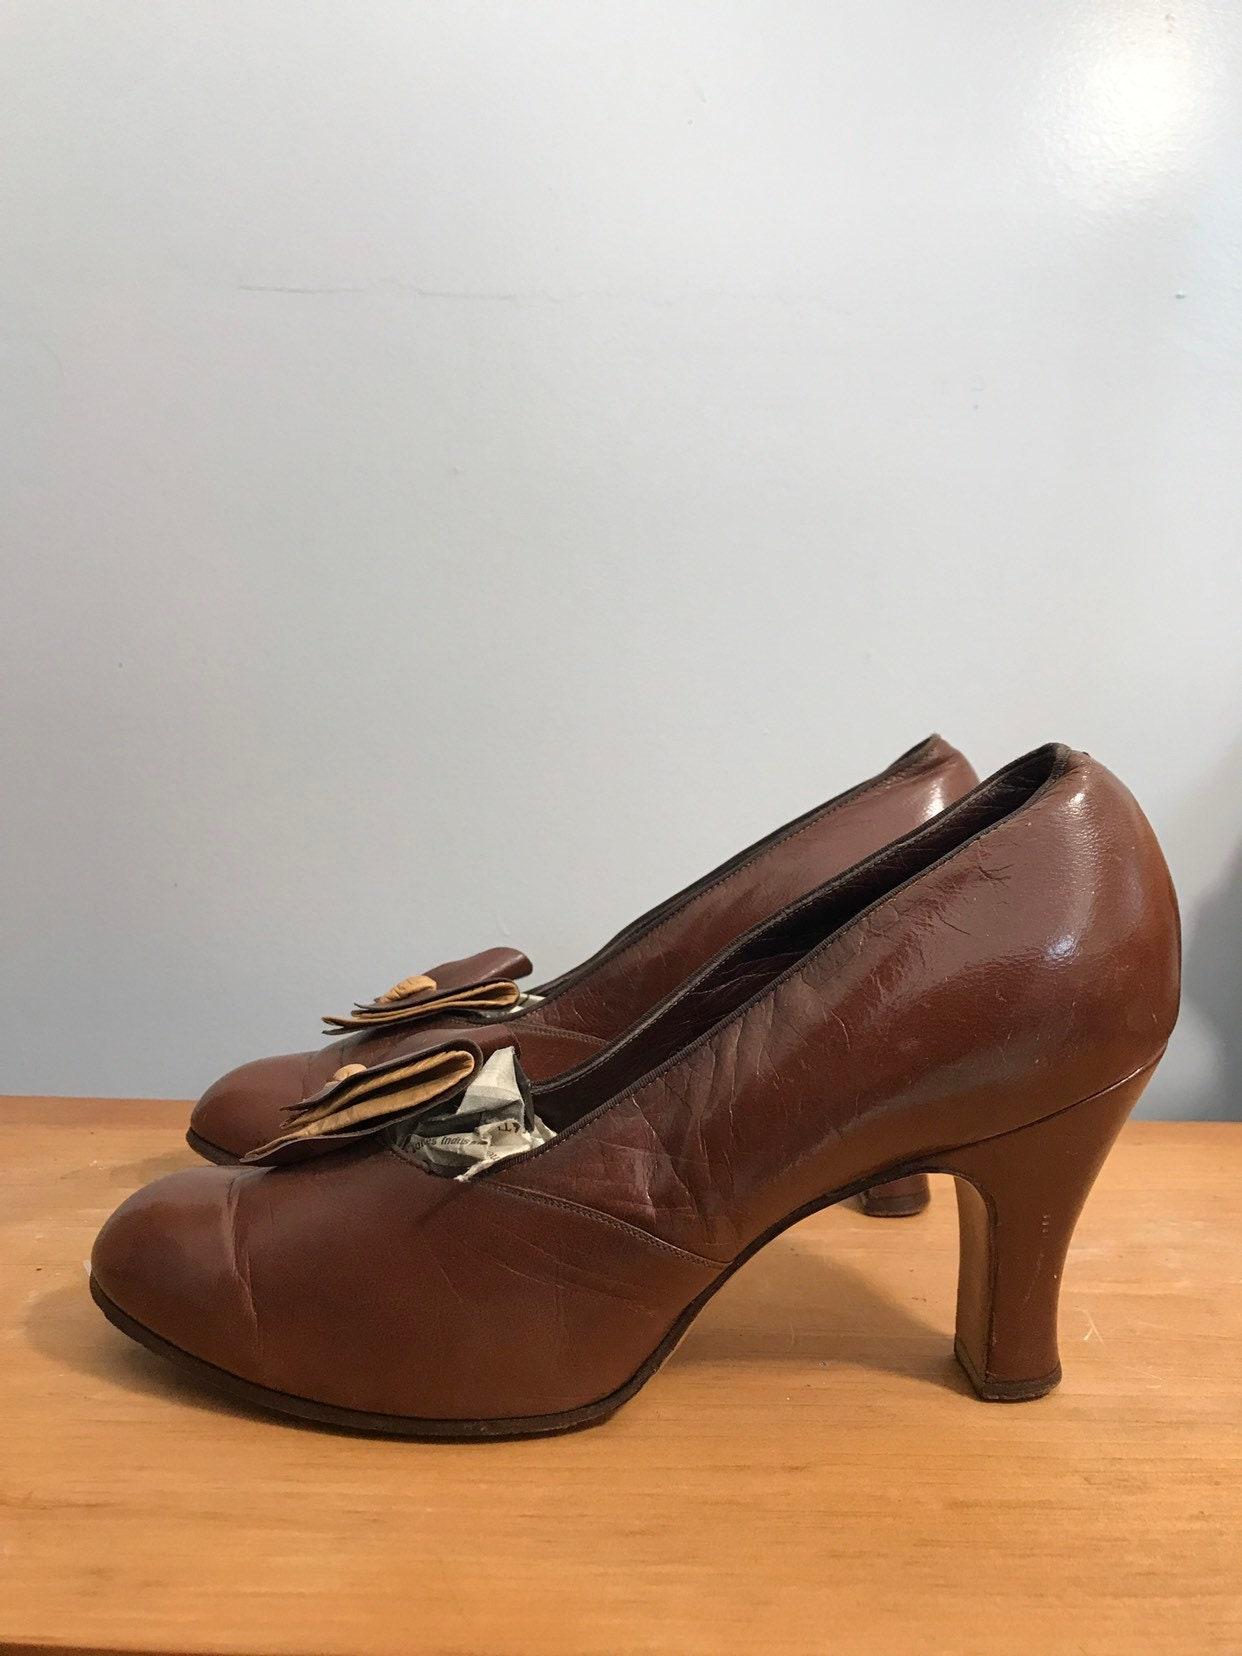 Deco High Depression Pumps Chocolate Bow Shoes 30s Era Brown Leather cLq54A3Rj